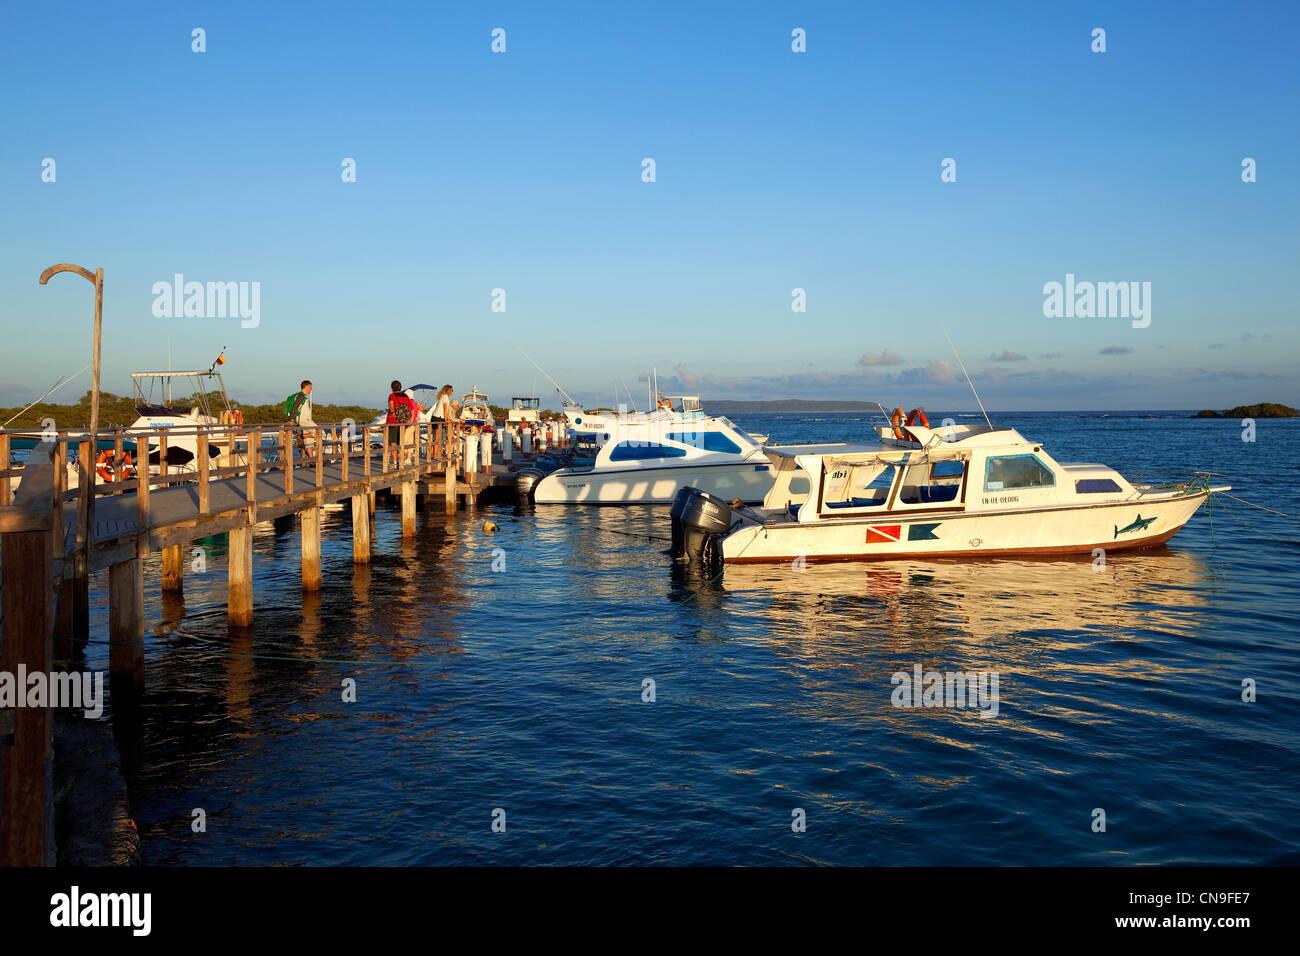 Ecuador, Galapagos Islands, Isabela Island, Puerto Villamil - Stock Image